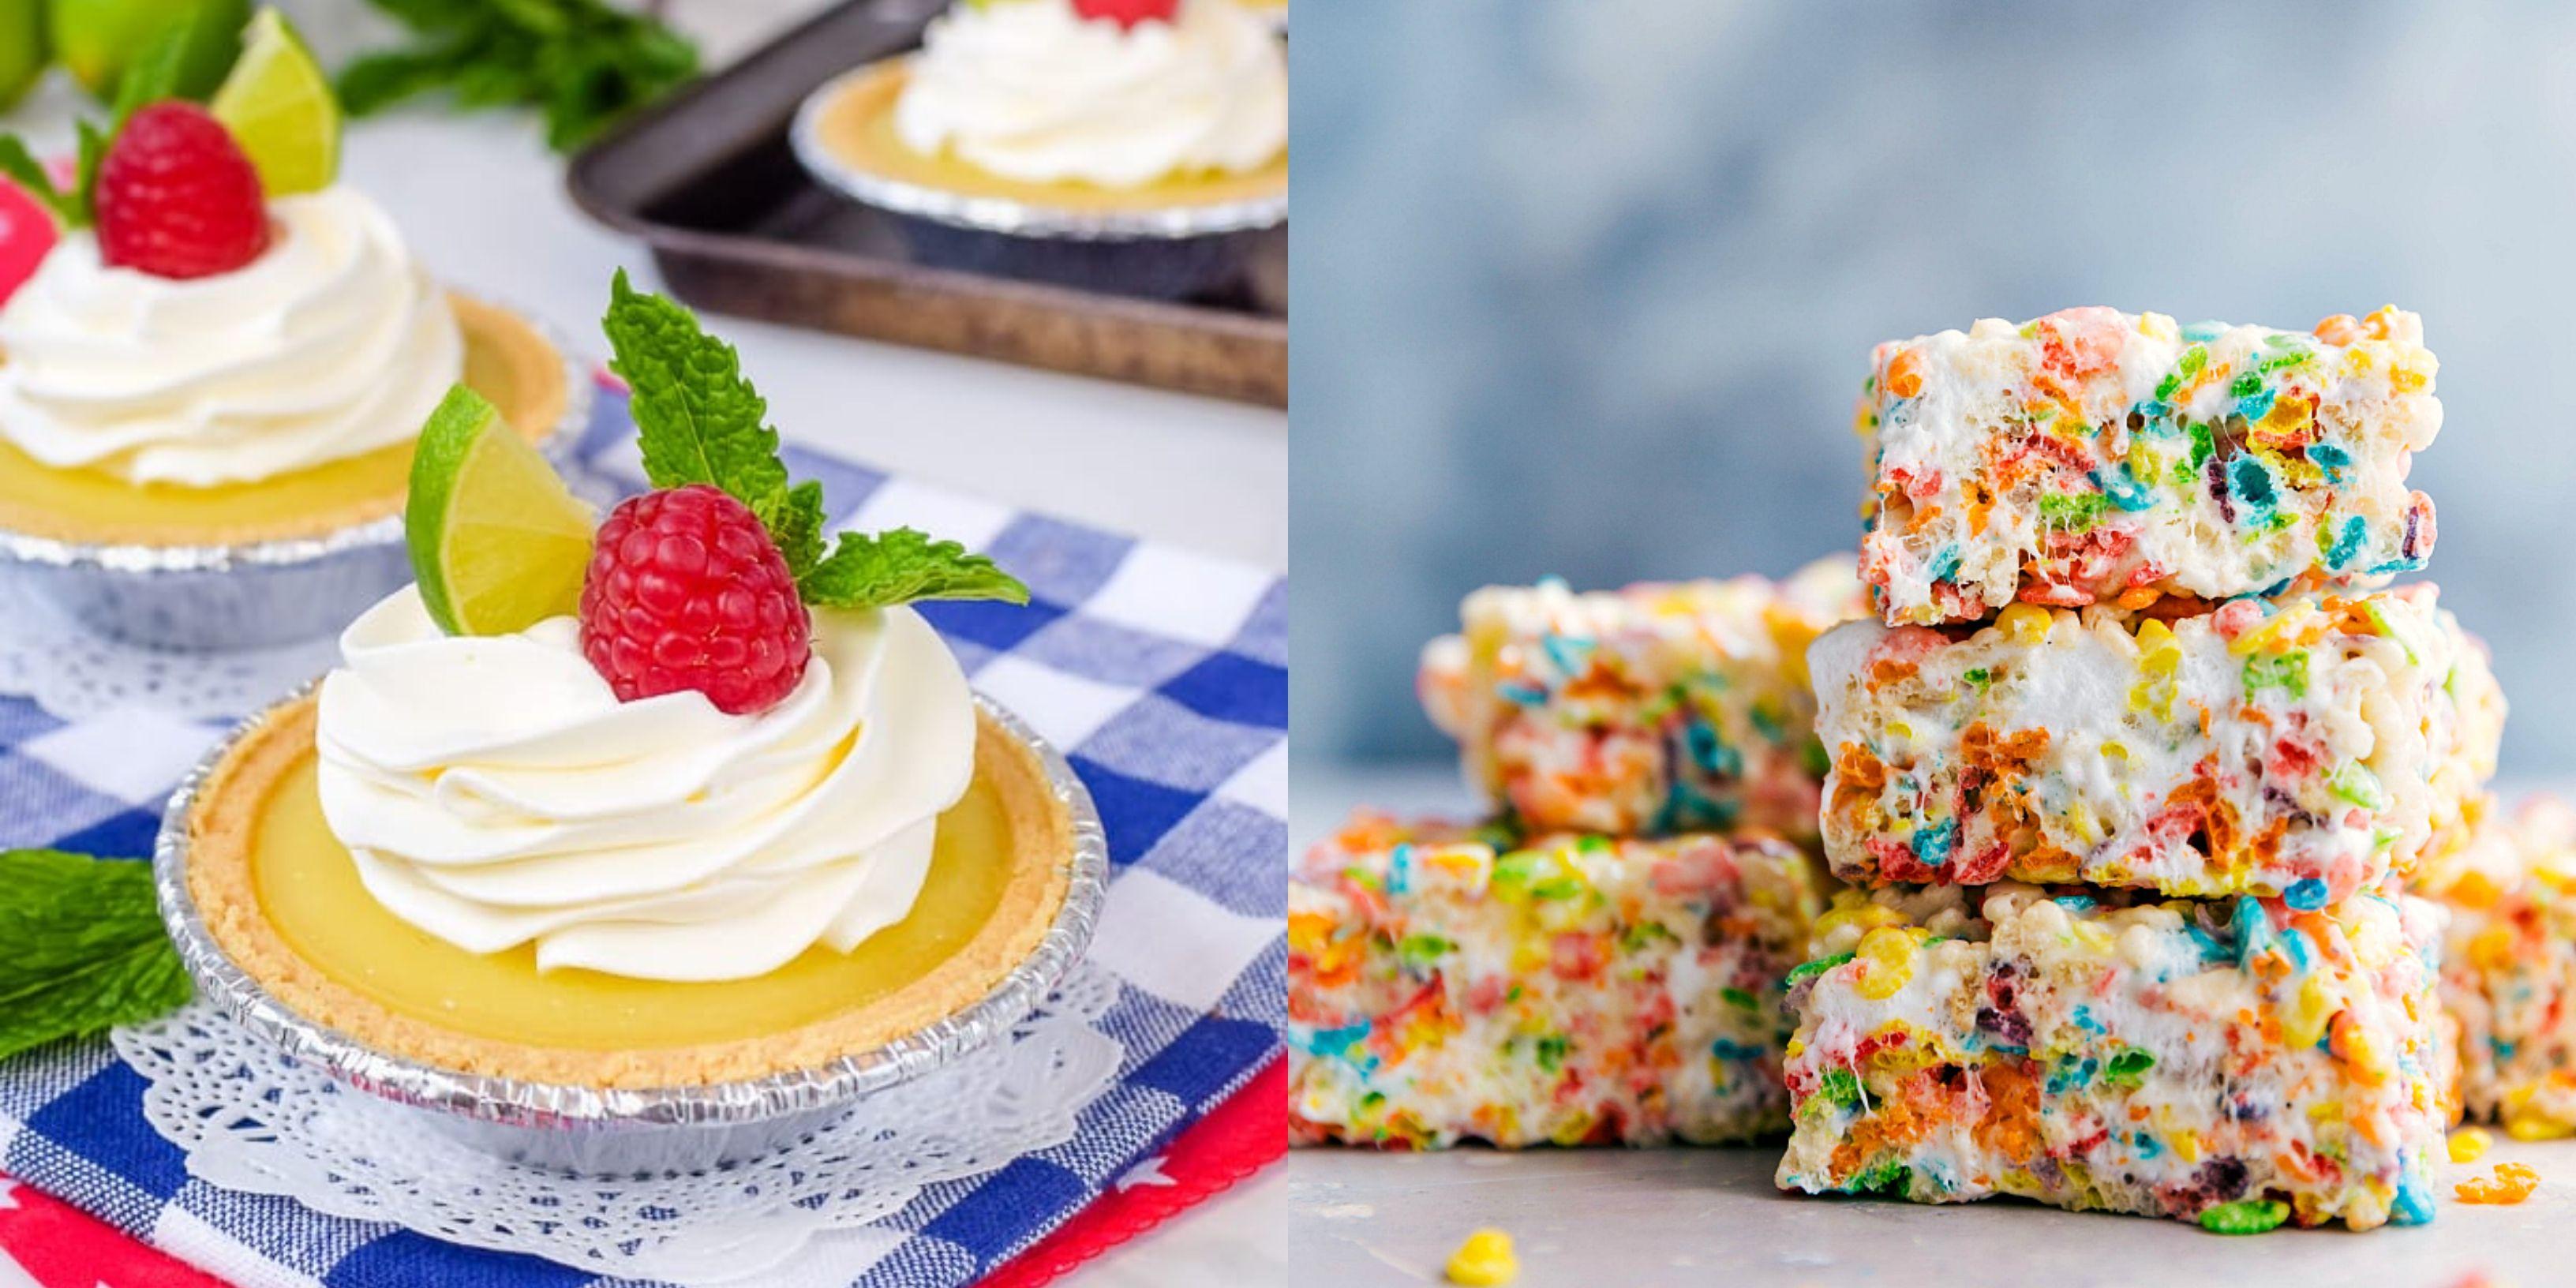 50 Easy No Bake Desserts Best Recipes For No Bake Treats